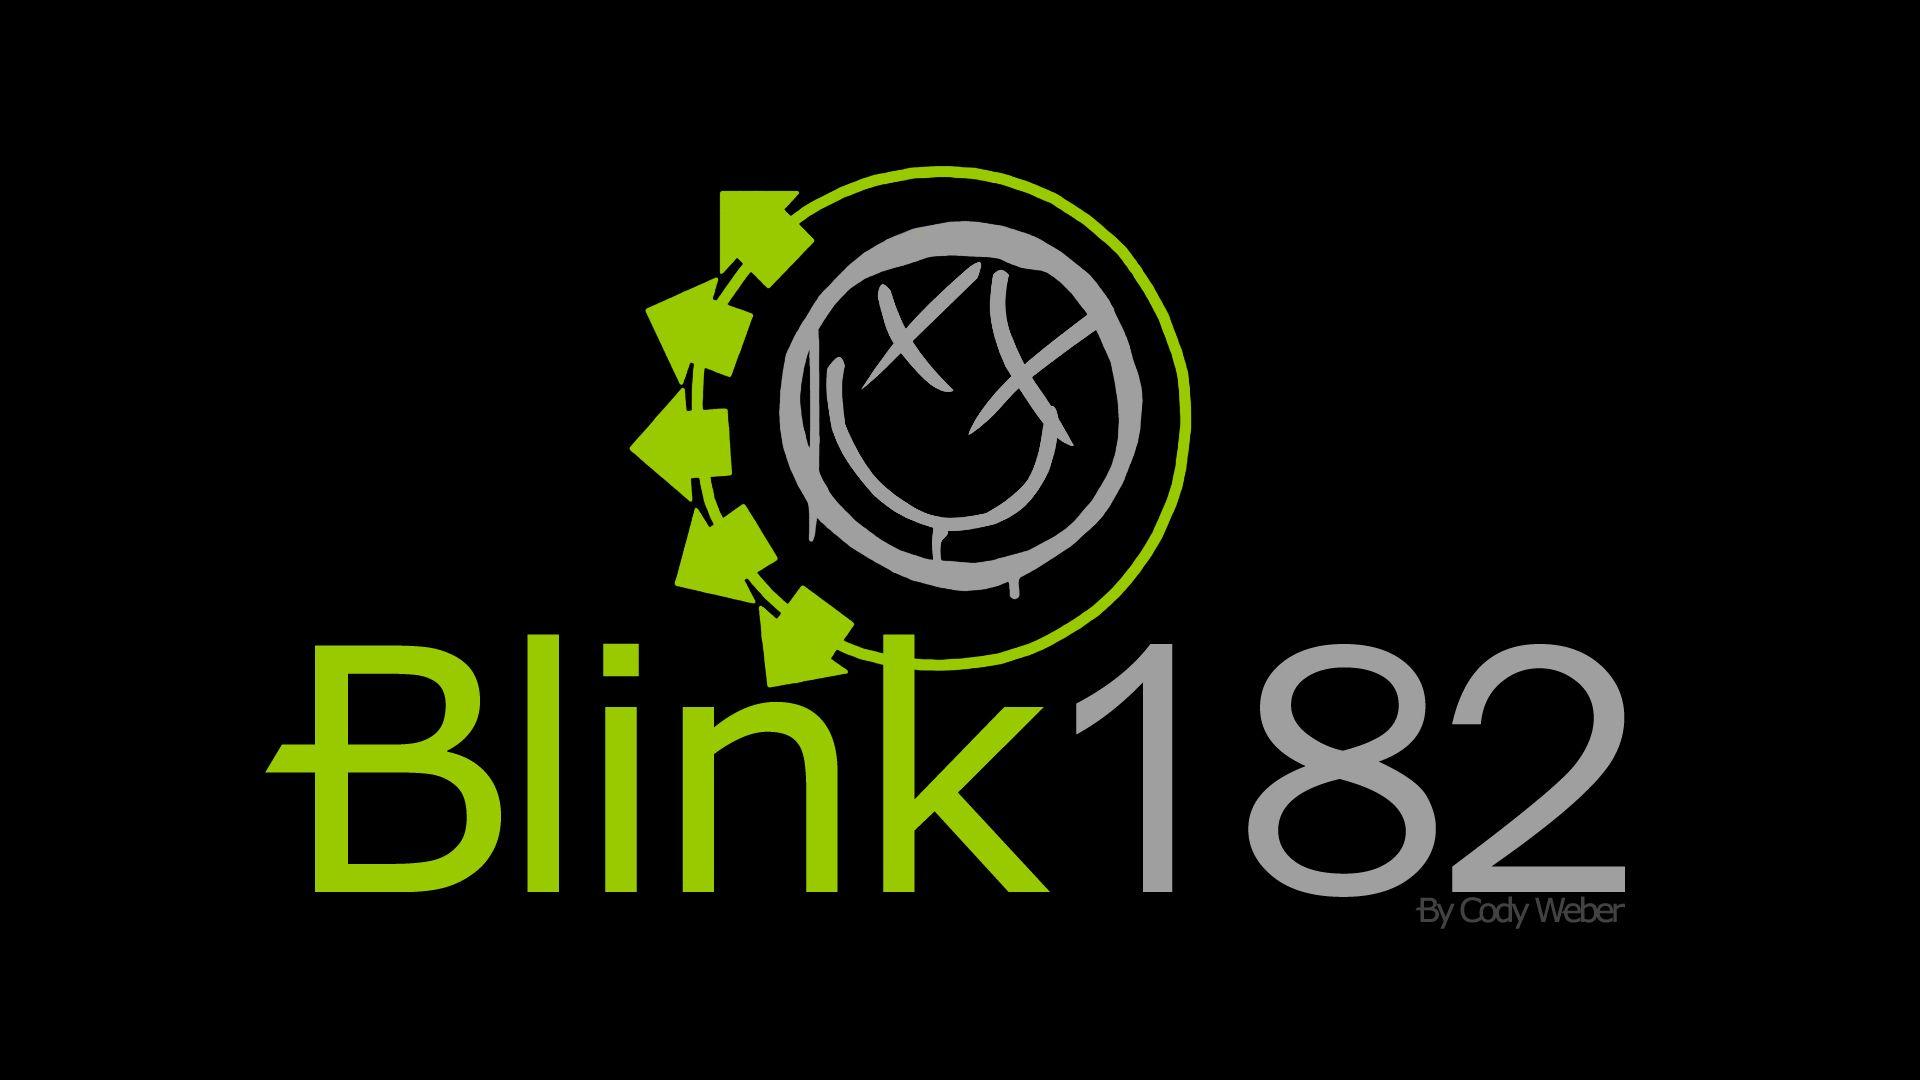 Blink 182 Logo Wallpaper Download HD Wallpapers Widescreen 1920x1080